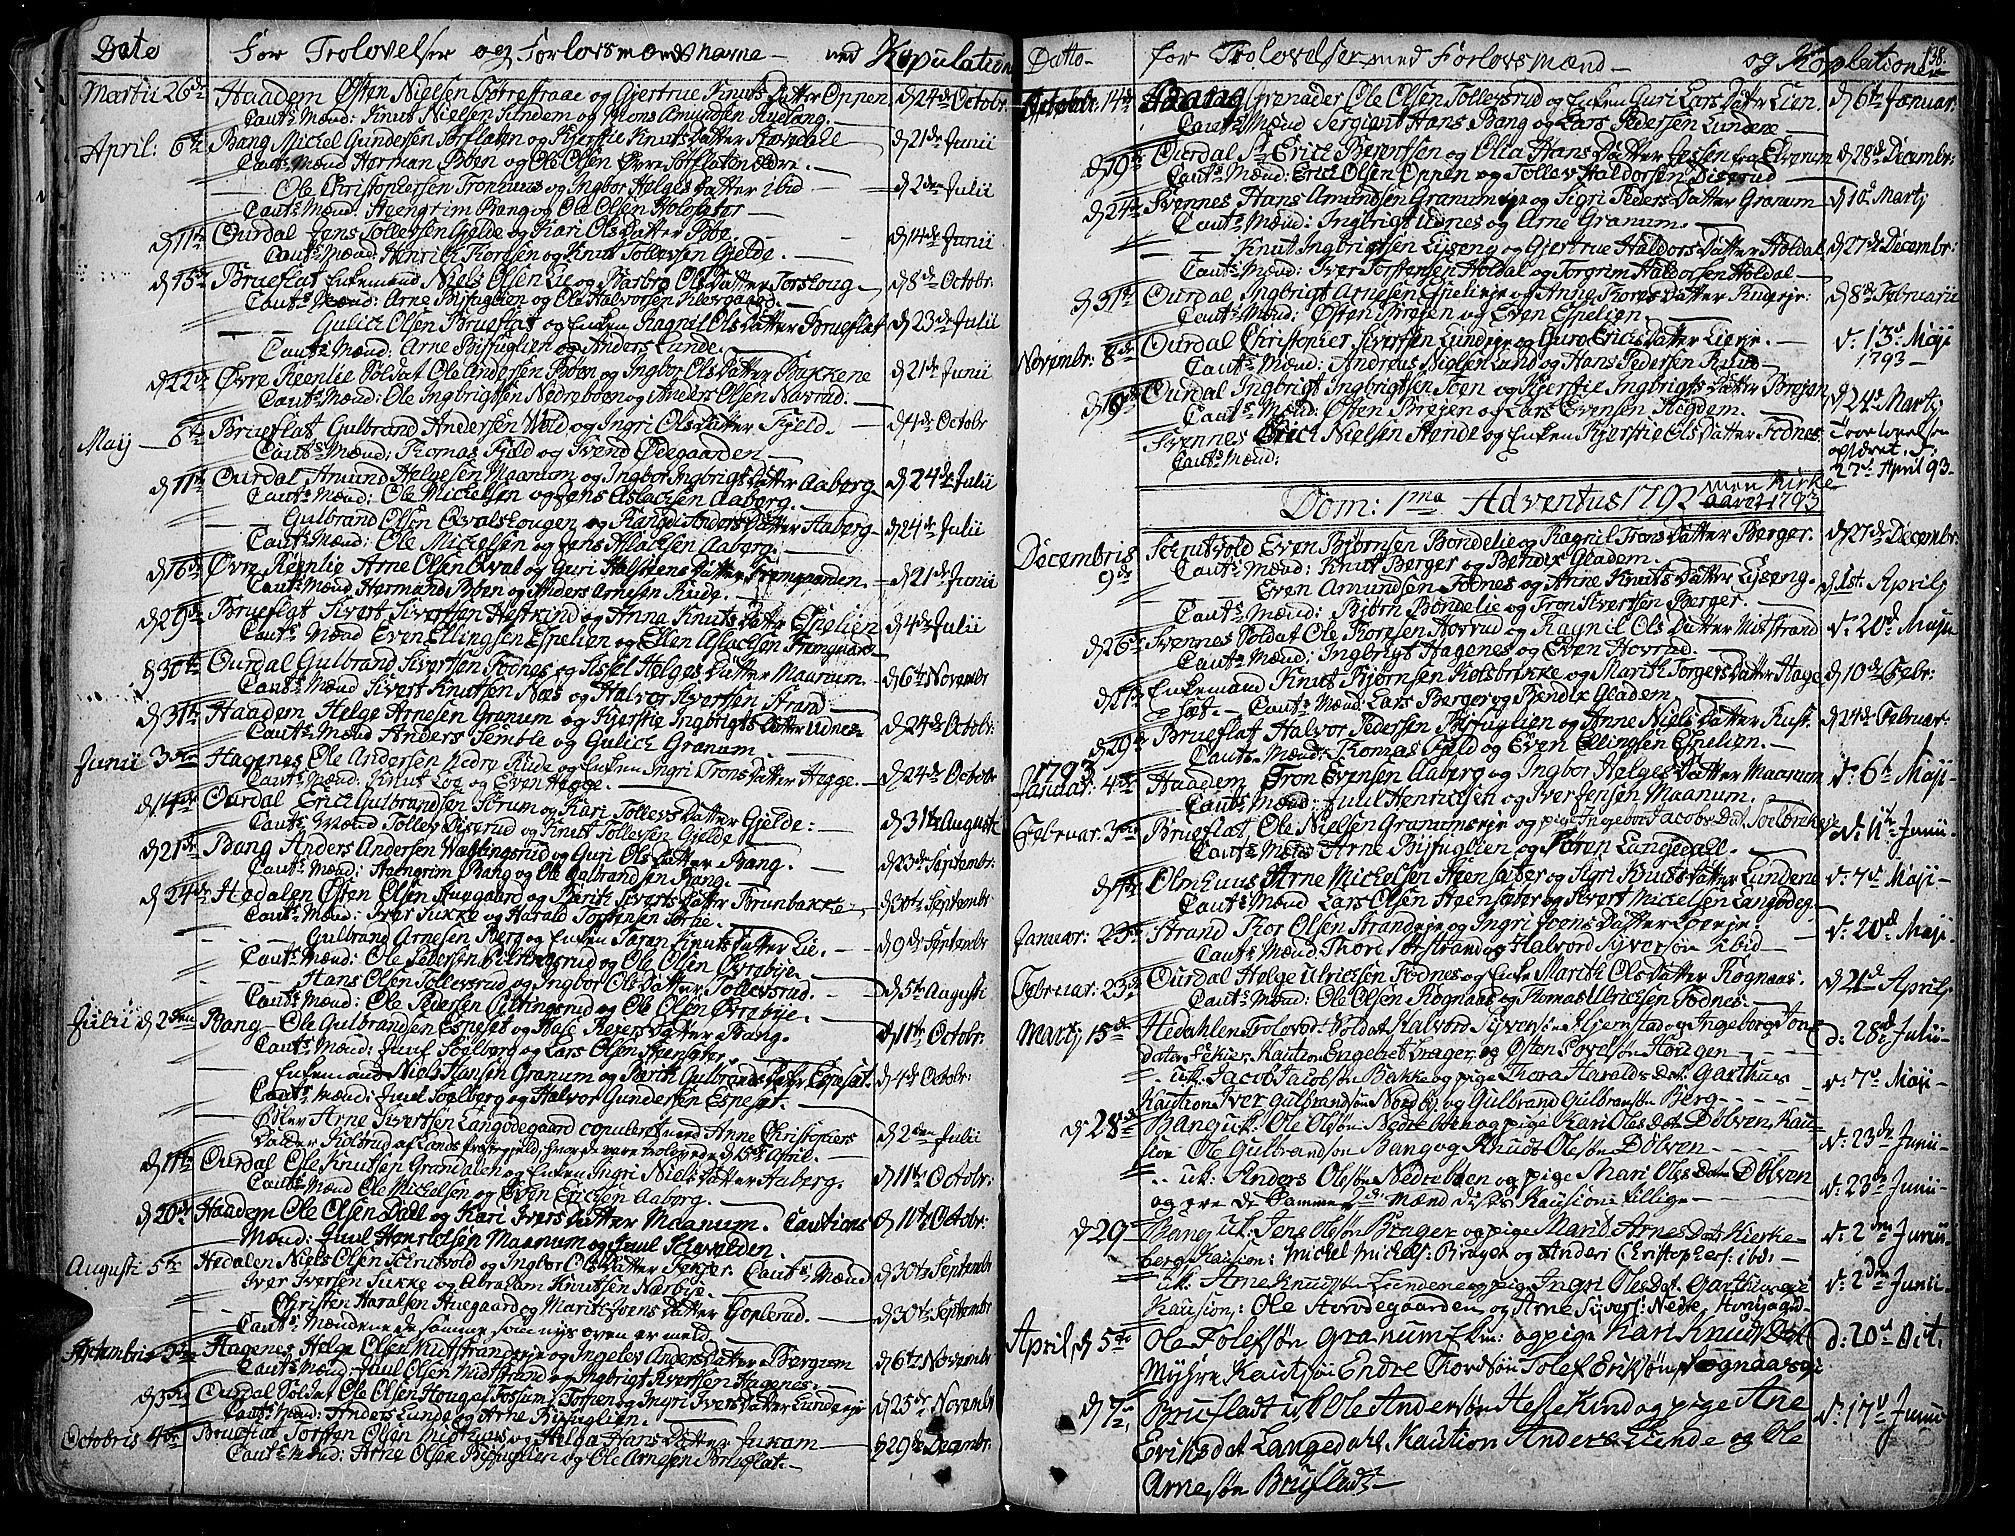 SAH, Aurdal prestekontor, Ministerialbok nr. 6, 1781-1804, s. 138